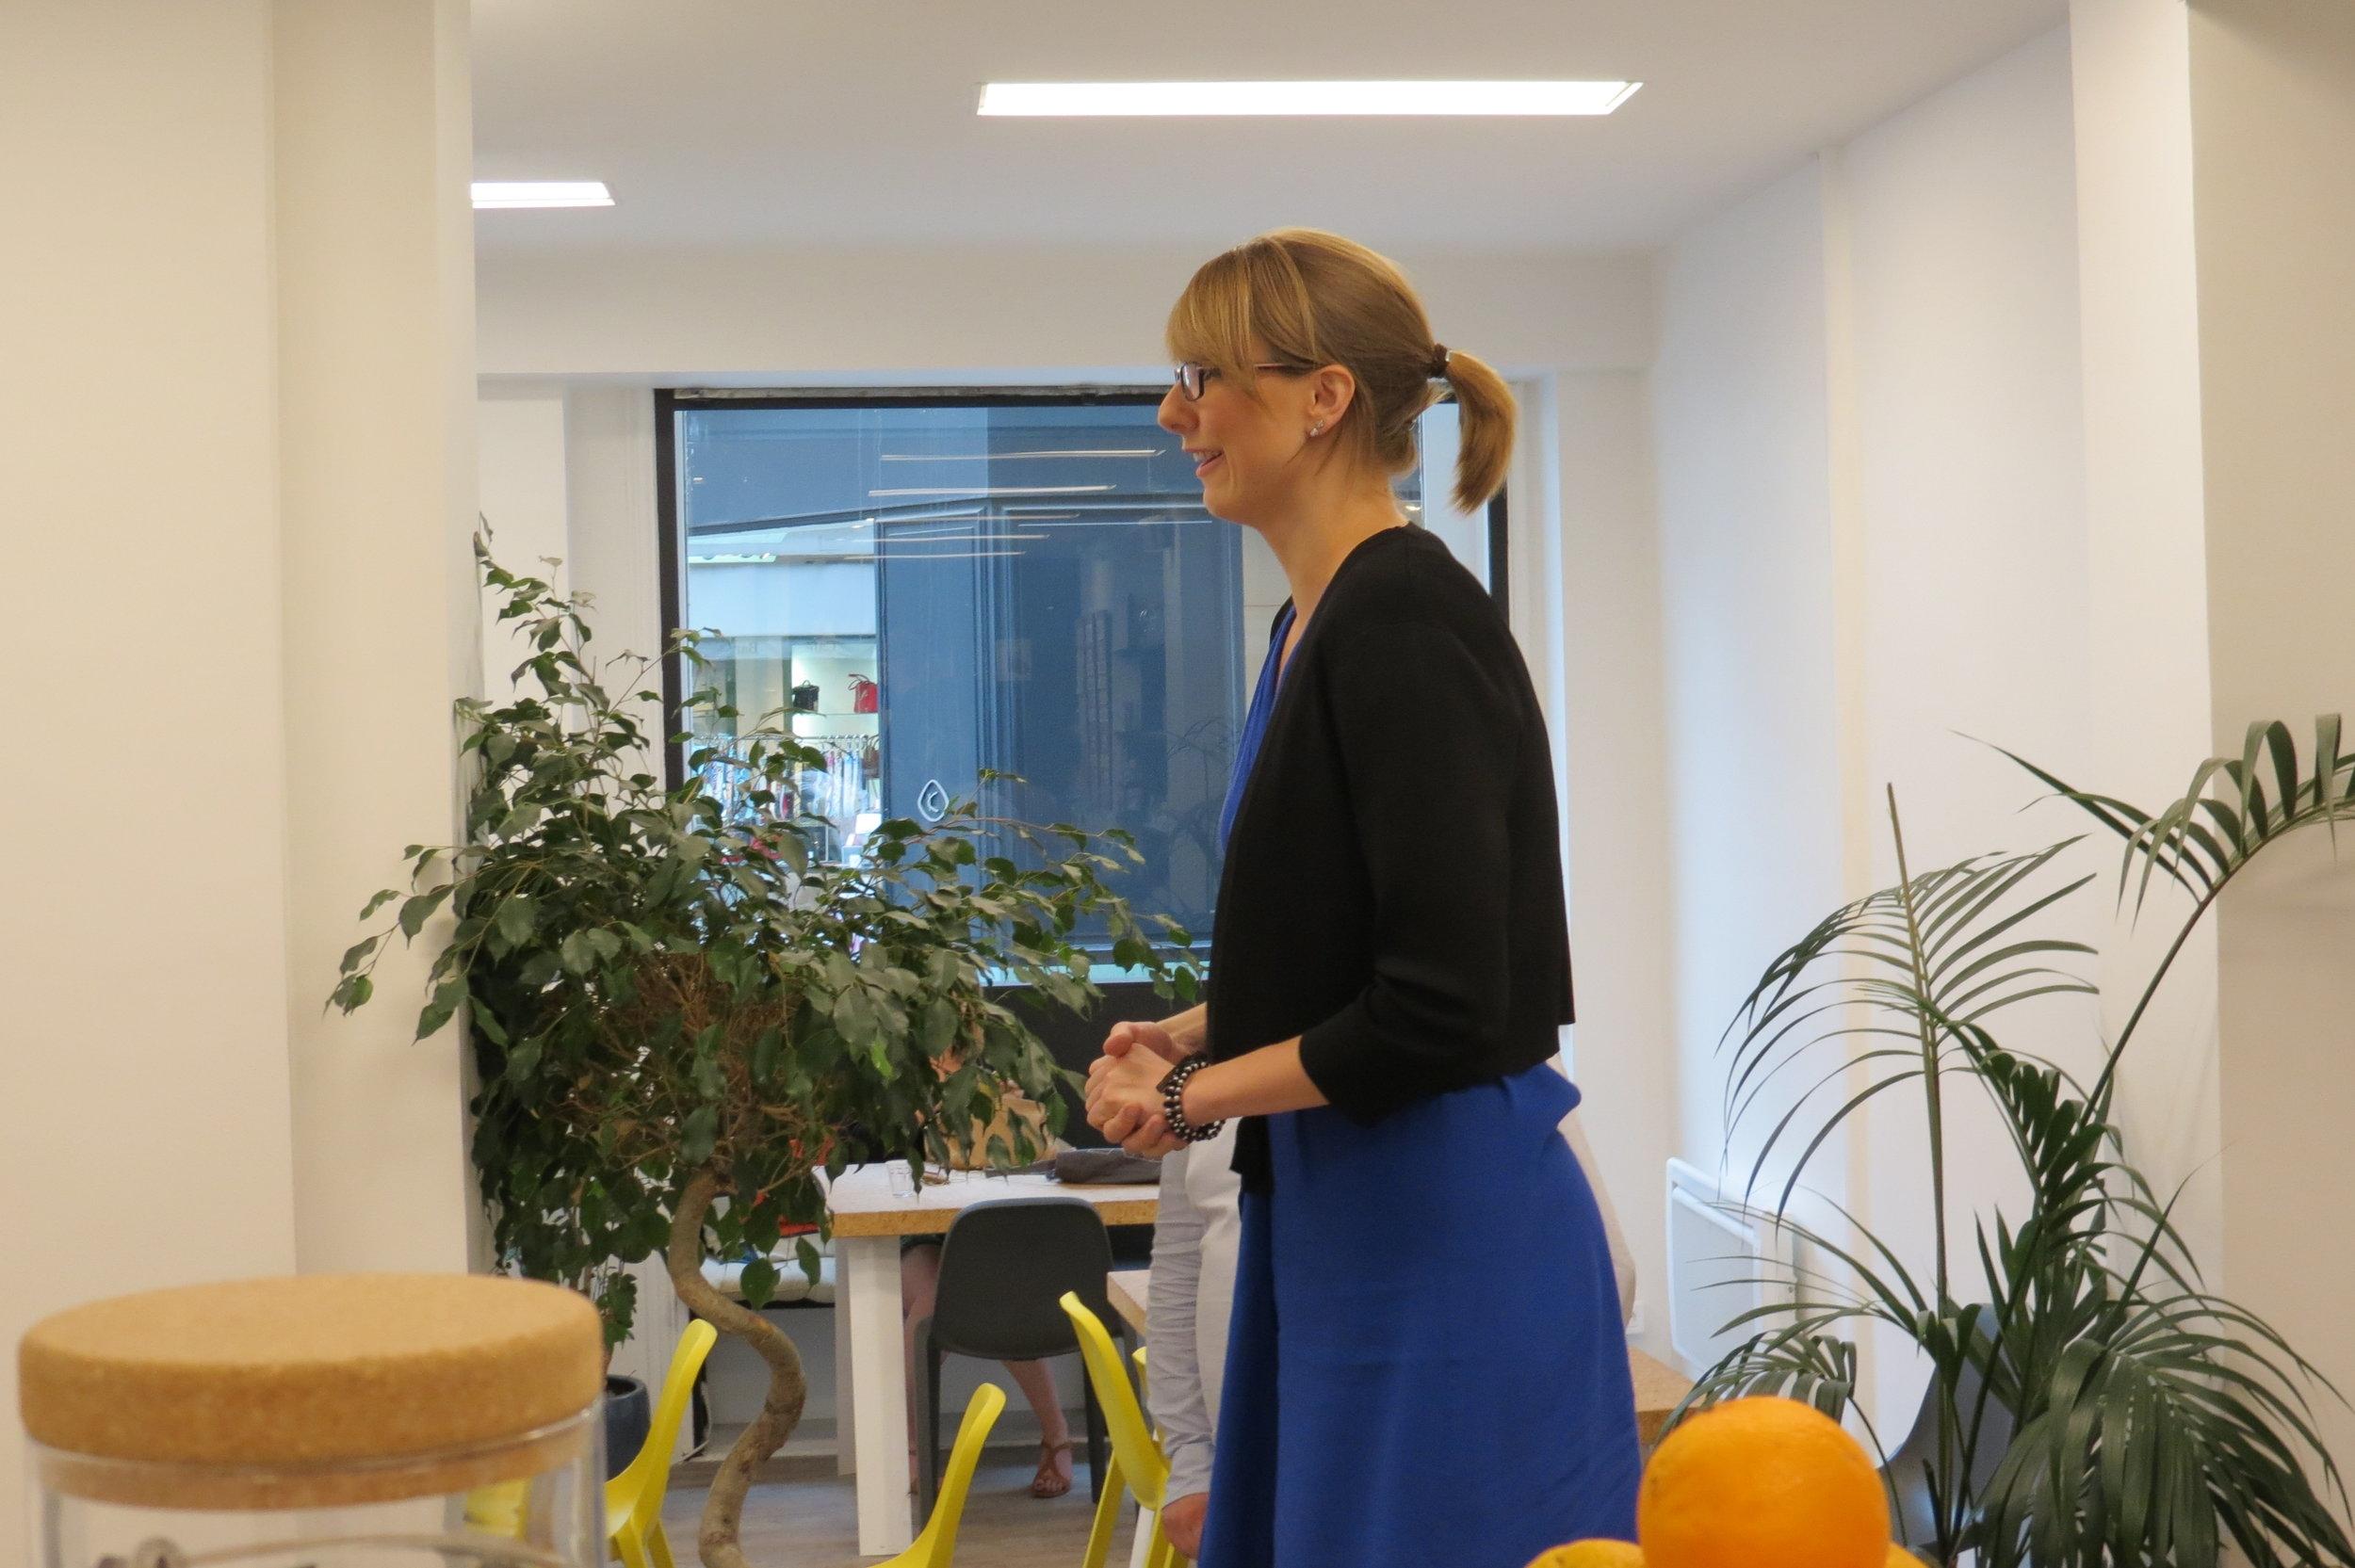 Anne Catherine Rosenblatt de Subteno, gagnante de la Licorne du mois en juillet 2017